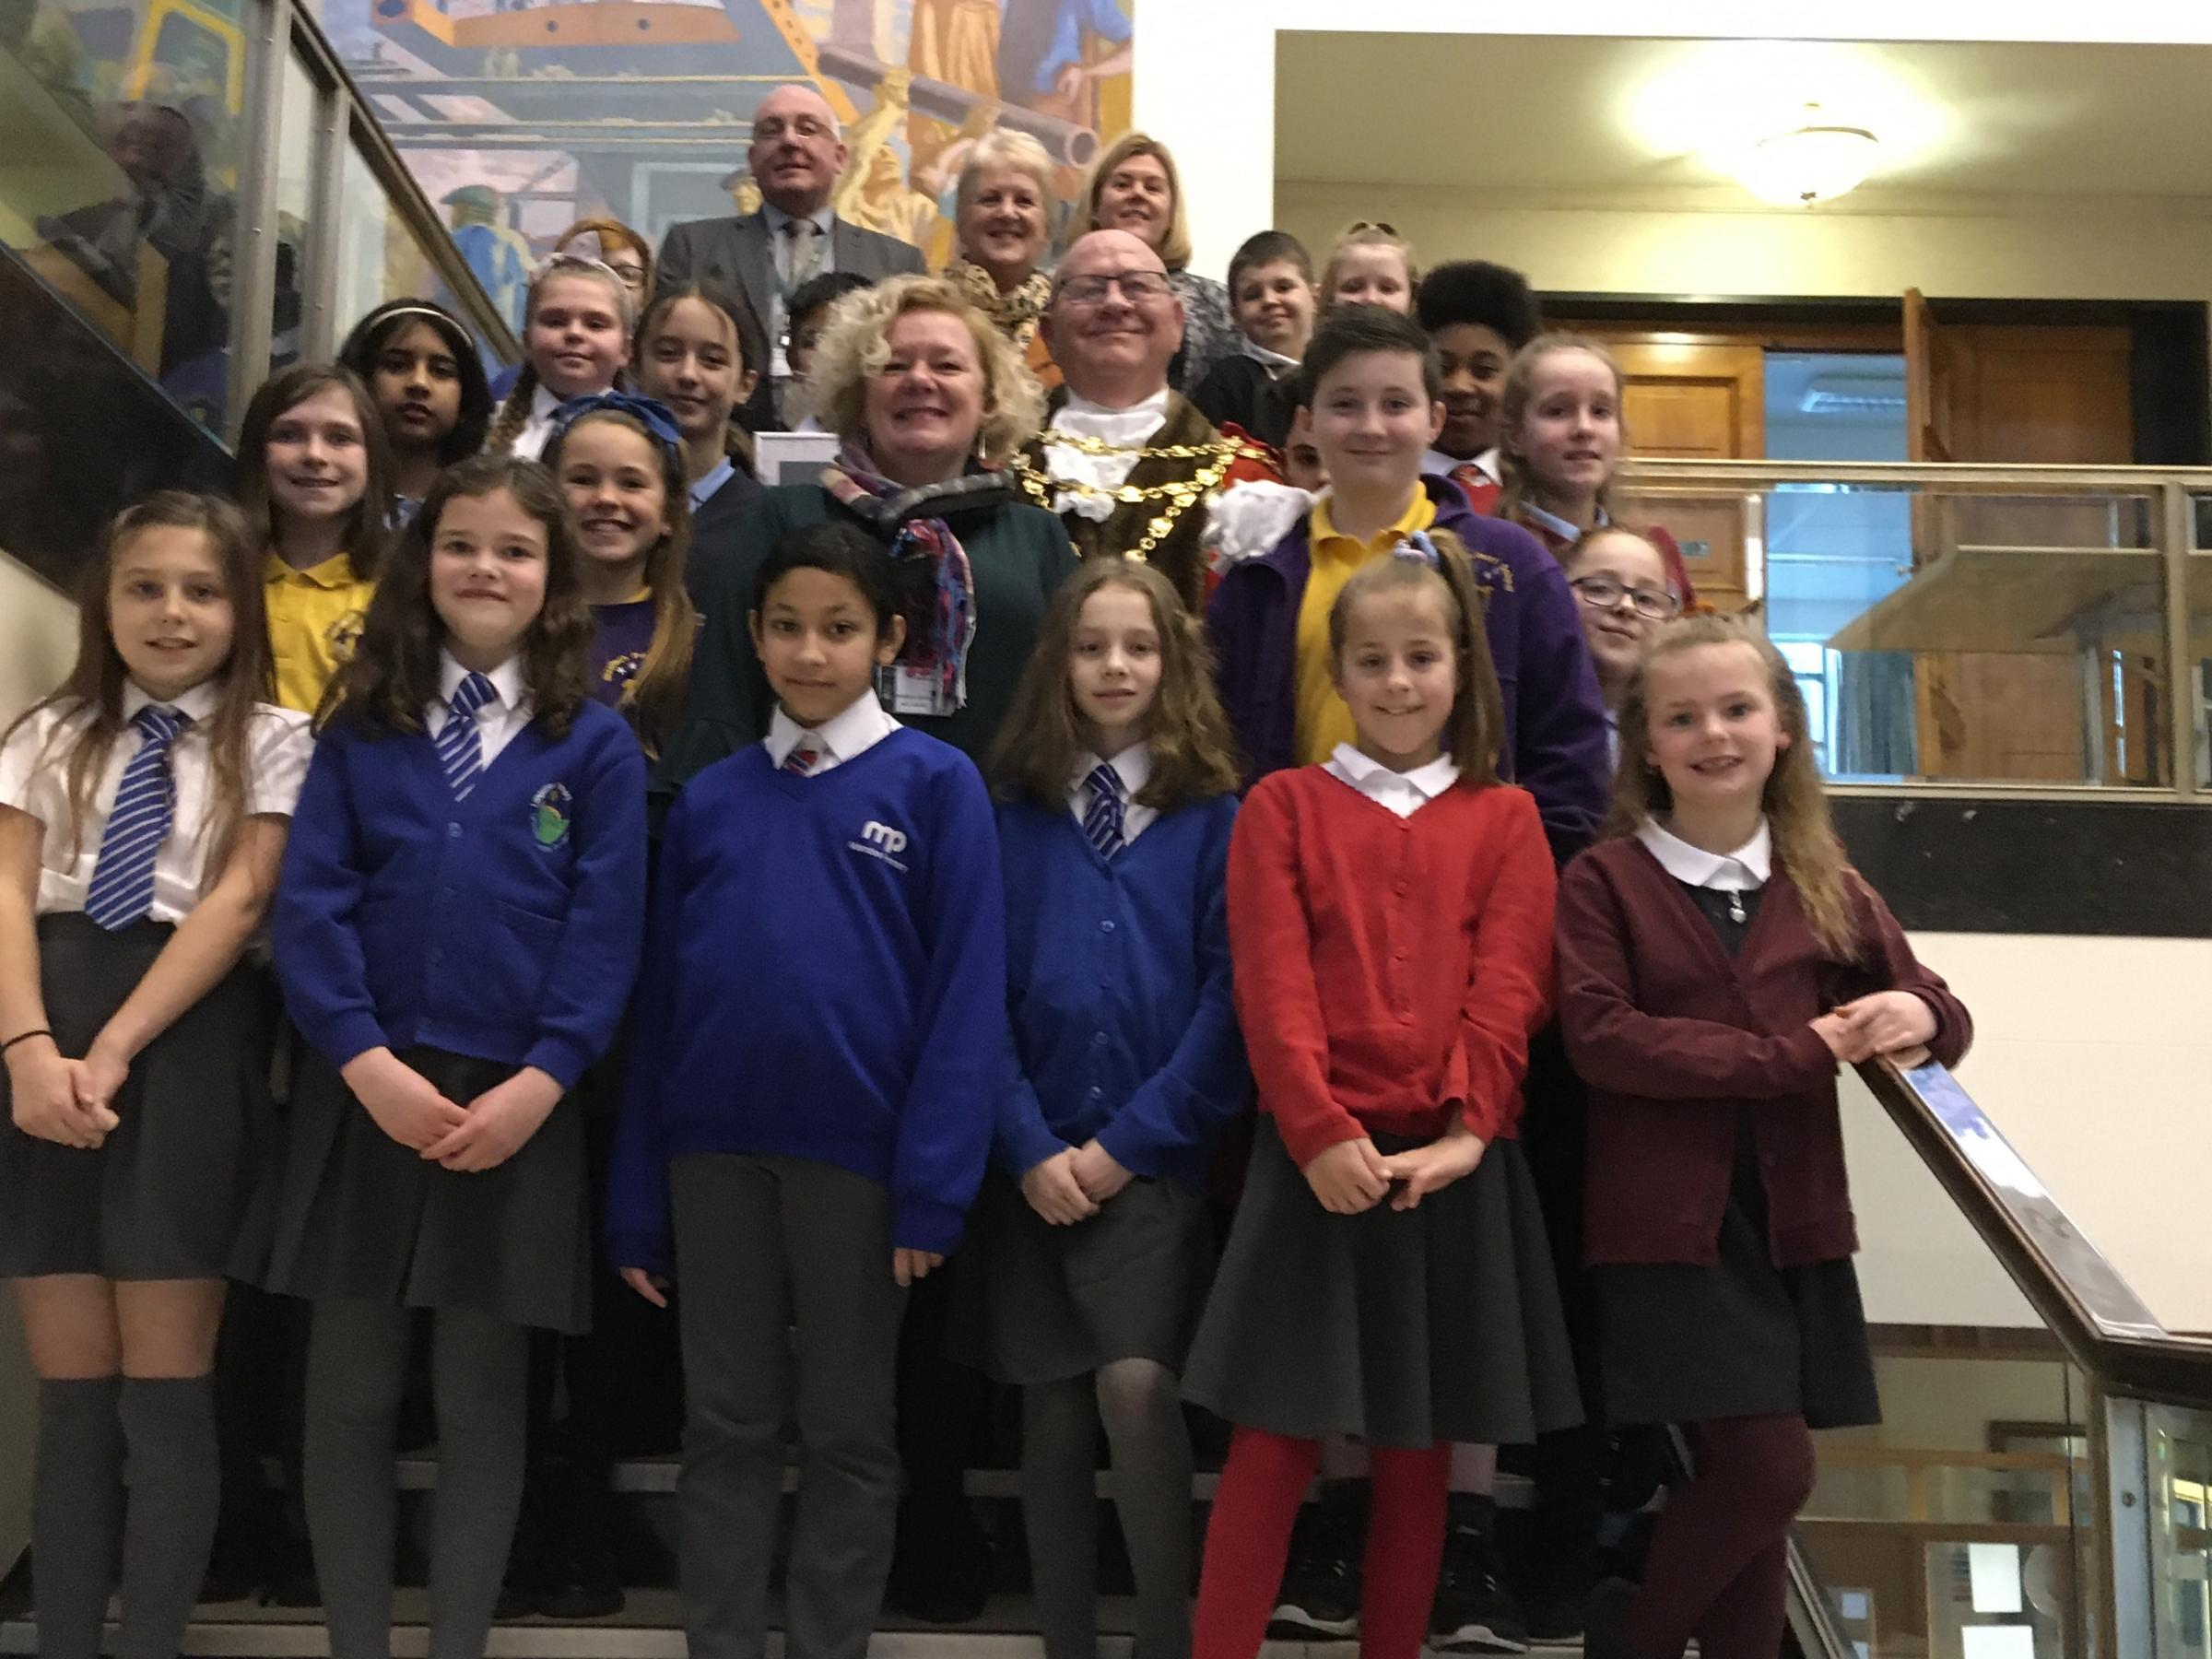 Newport pupils and schools rewarded in healthy living initiative